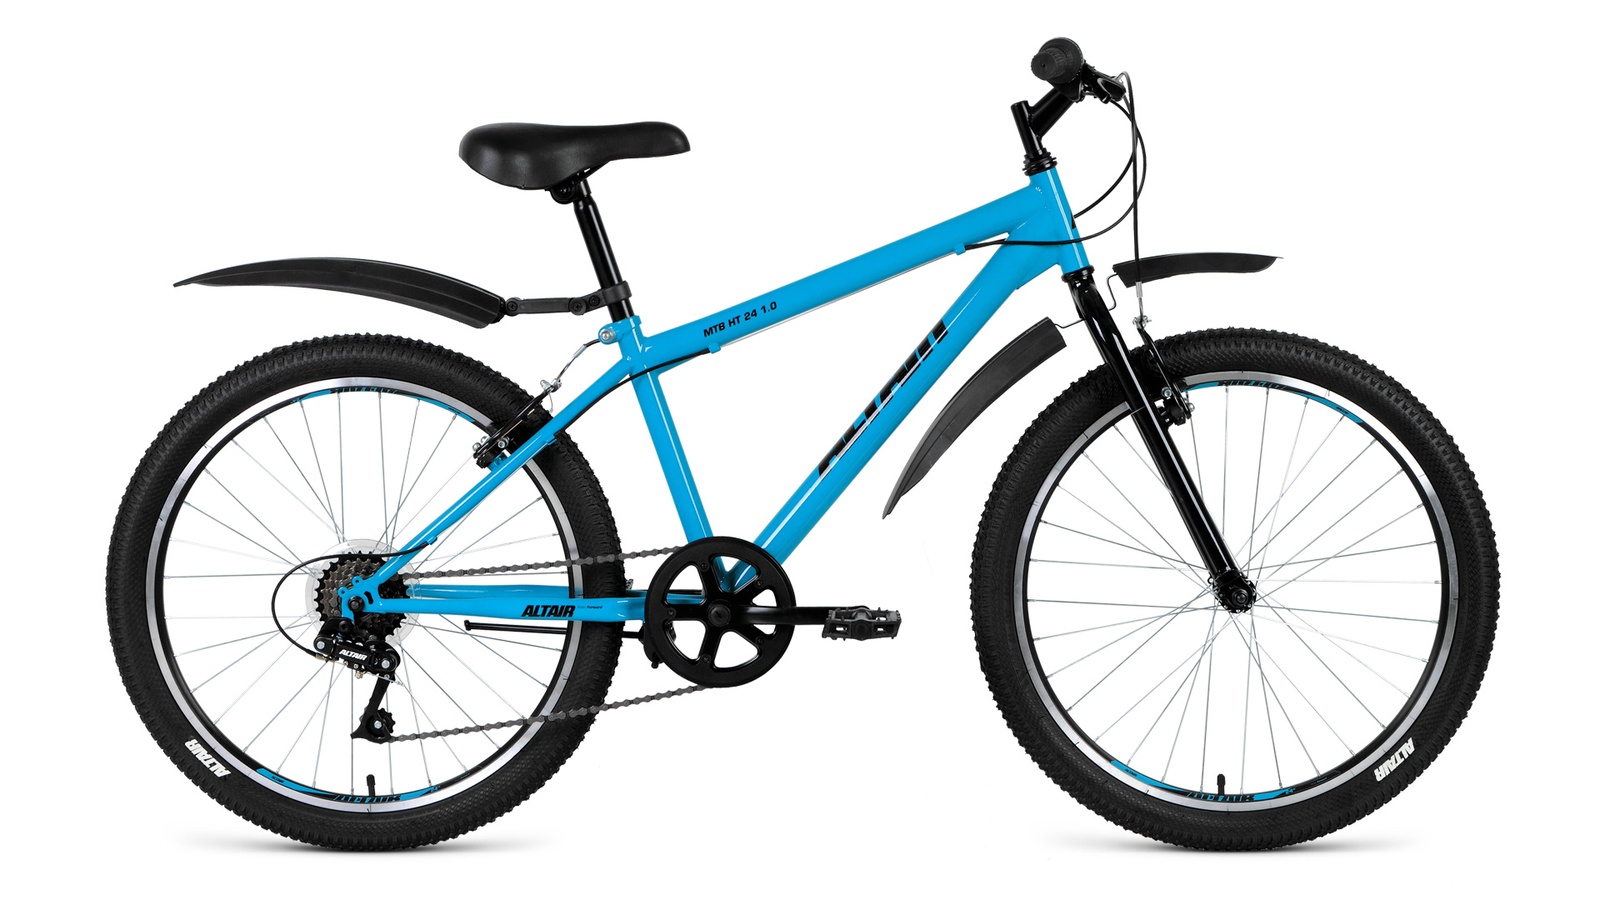 цена на Велосипед Altair MTB HT 24 1.0 2019, бирюзовый